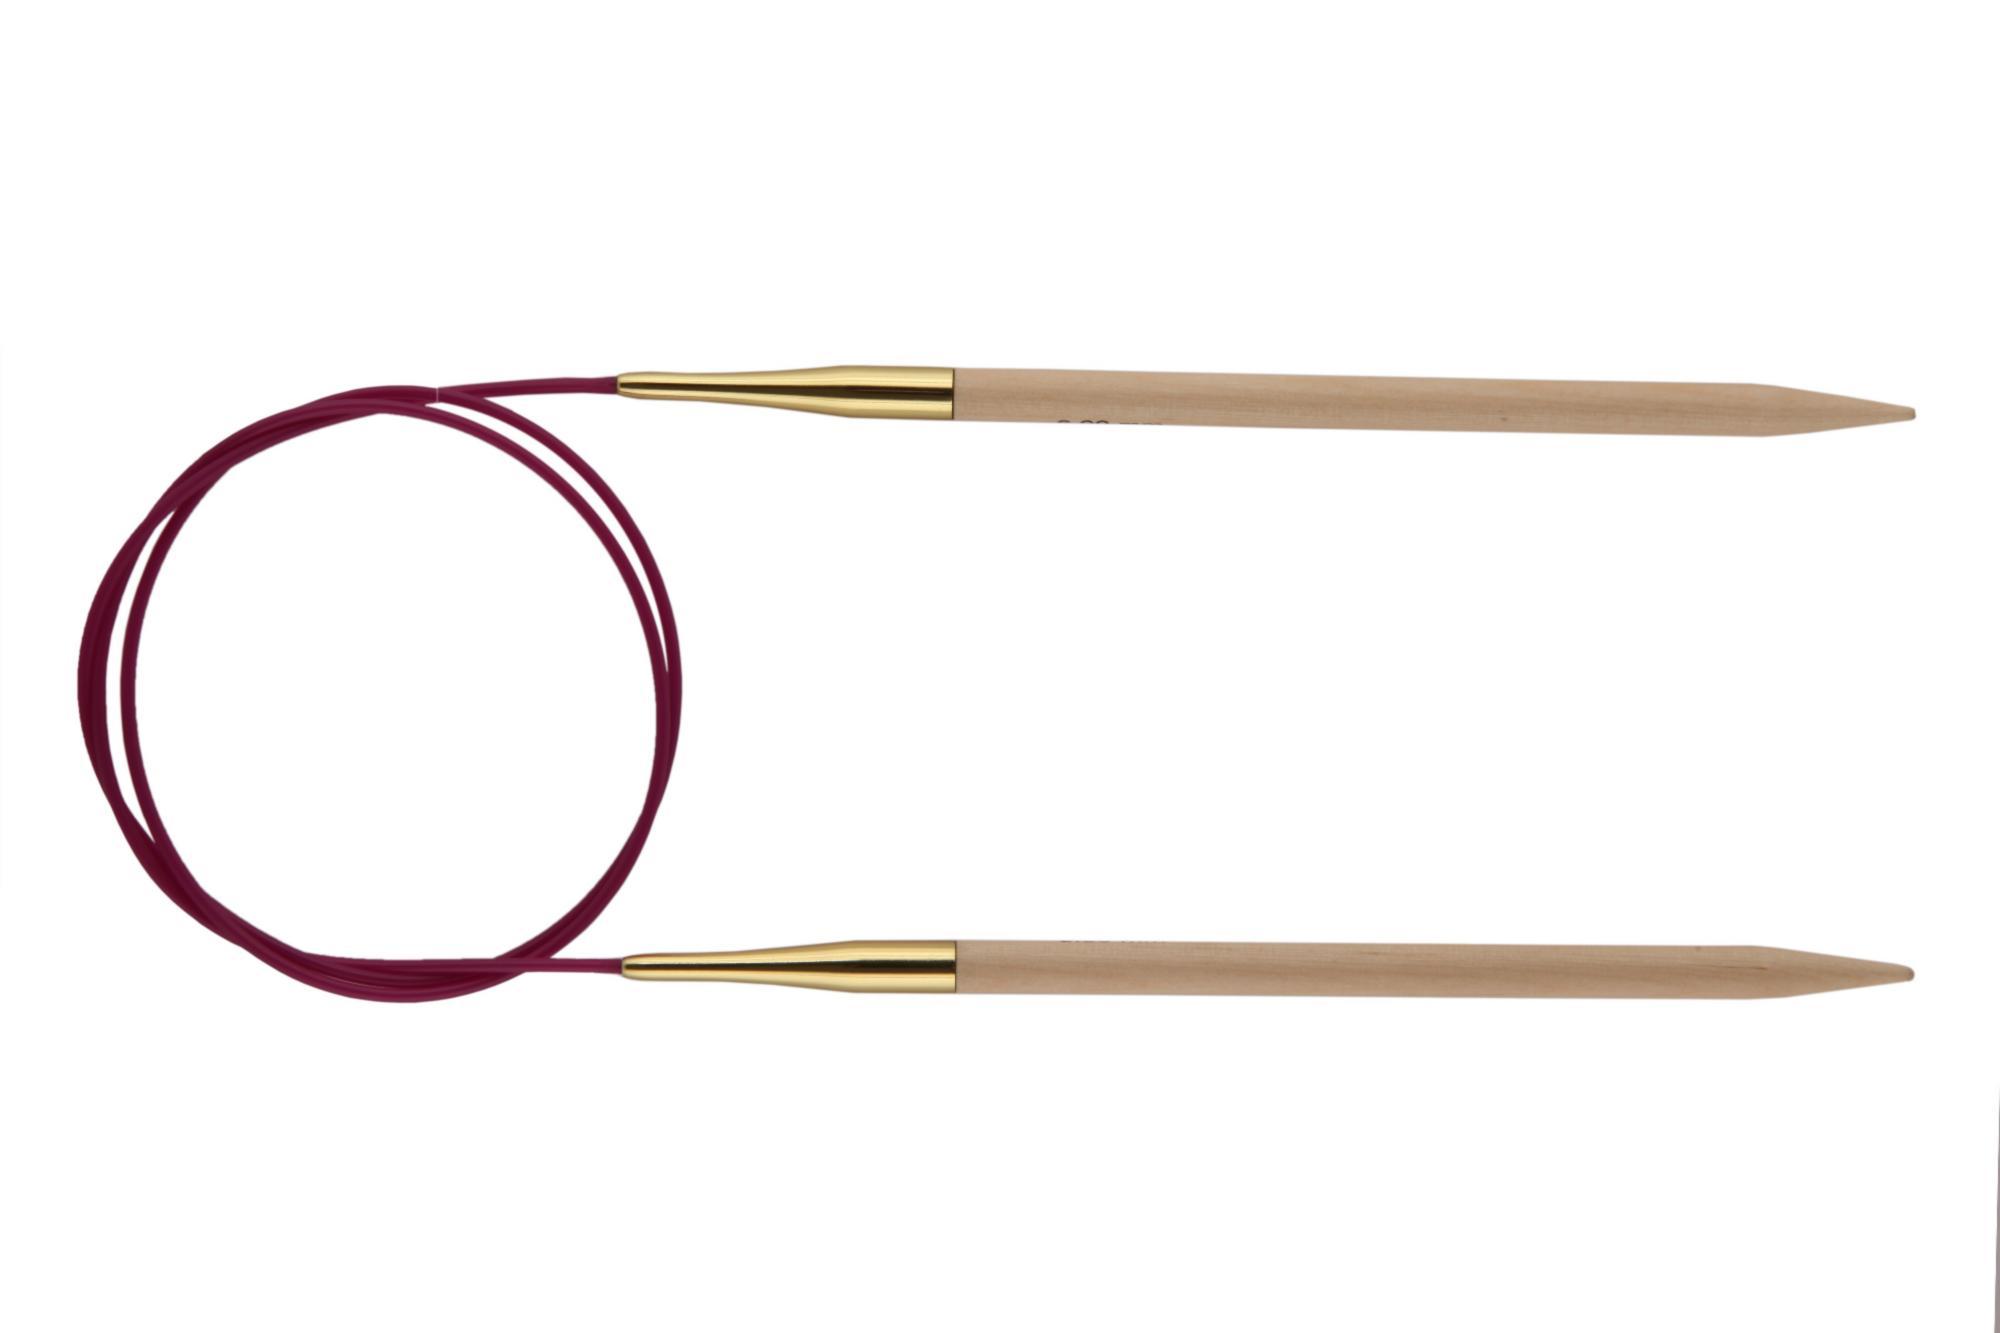 Спицы круговые 100 см Basix Birch Wood KnitPro, 35615, 3.00 мм